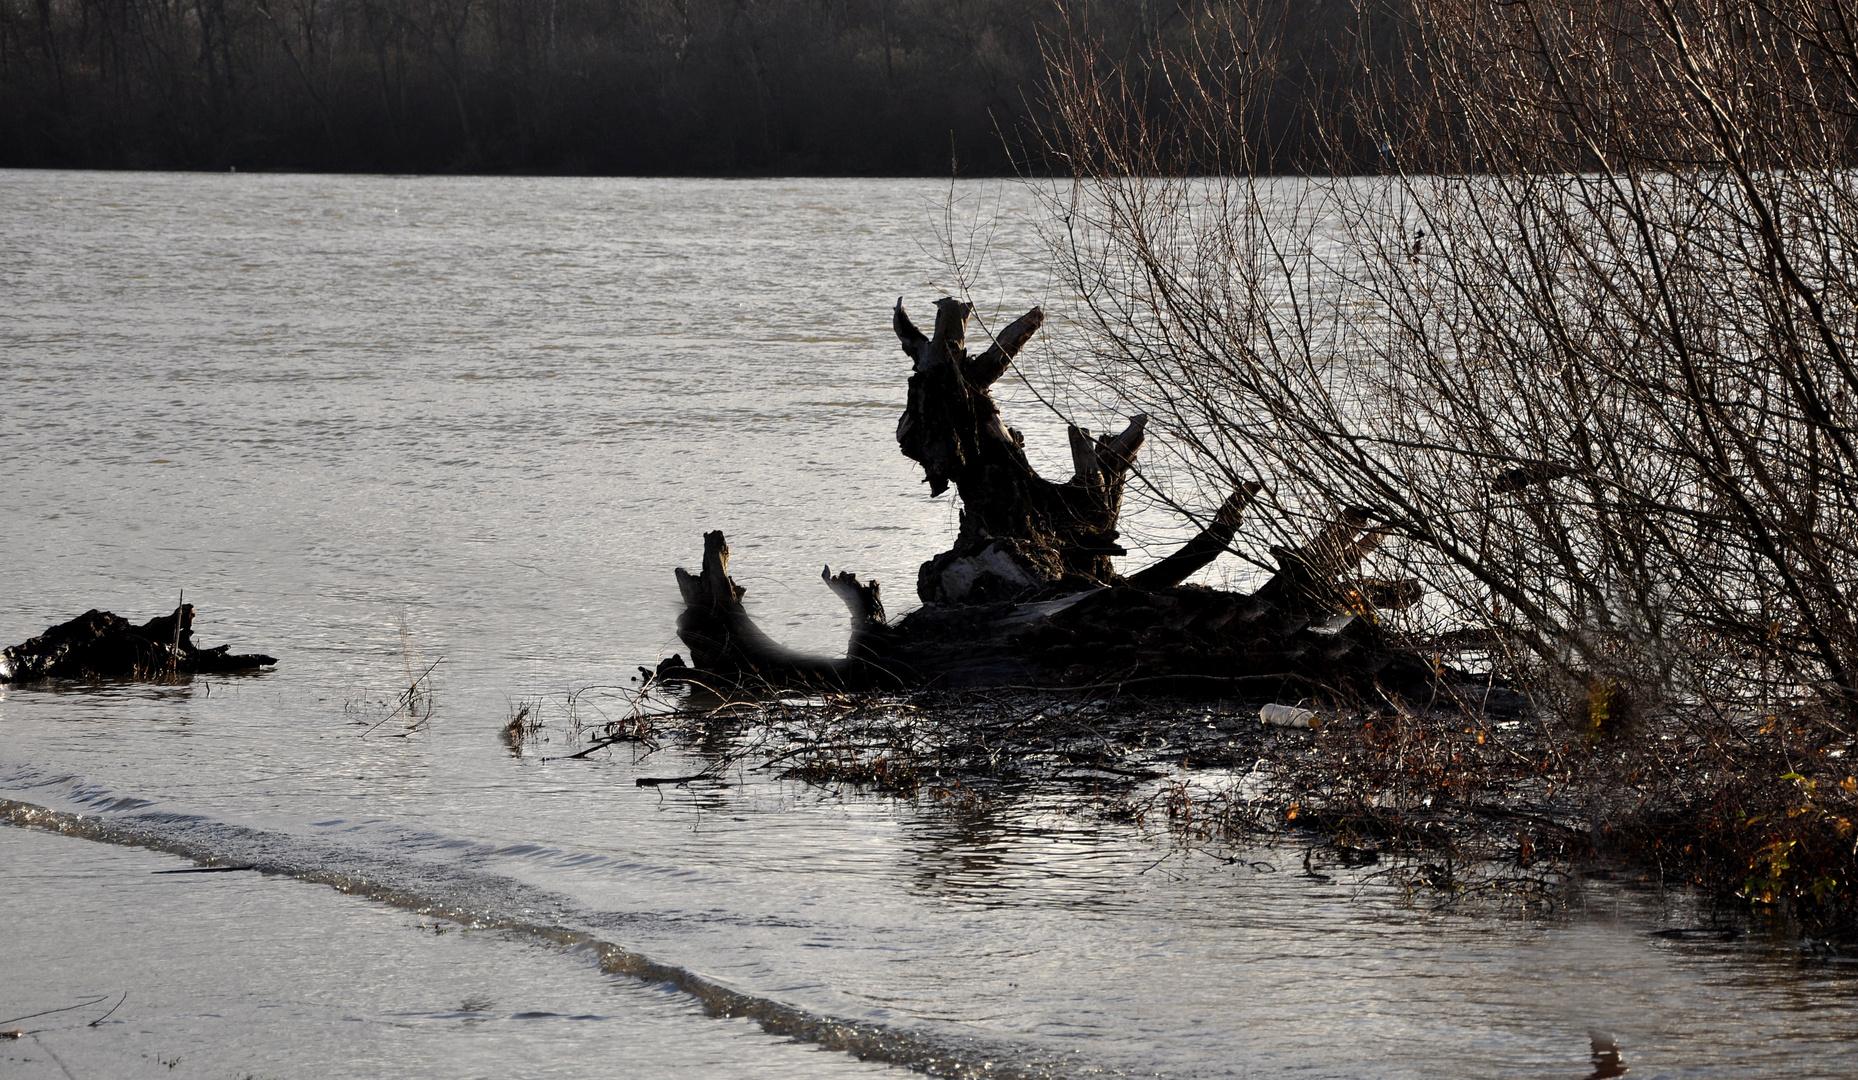 Määäääh, Geißbock versucht dem Wasser zu entkommen....